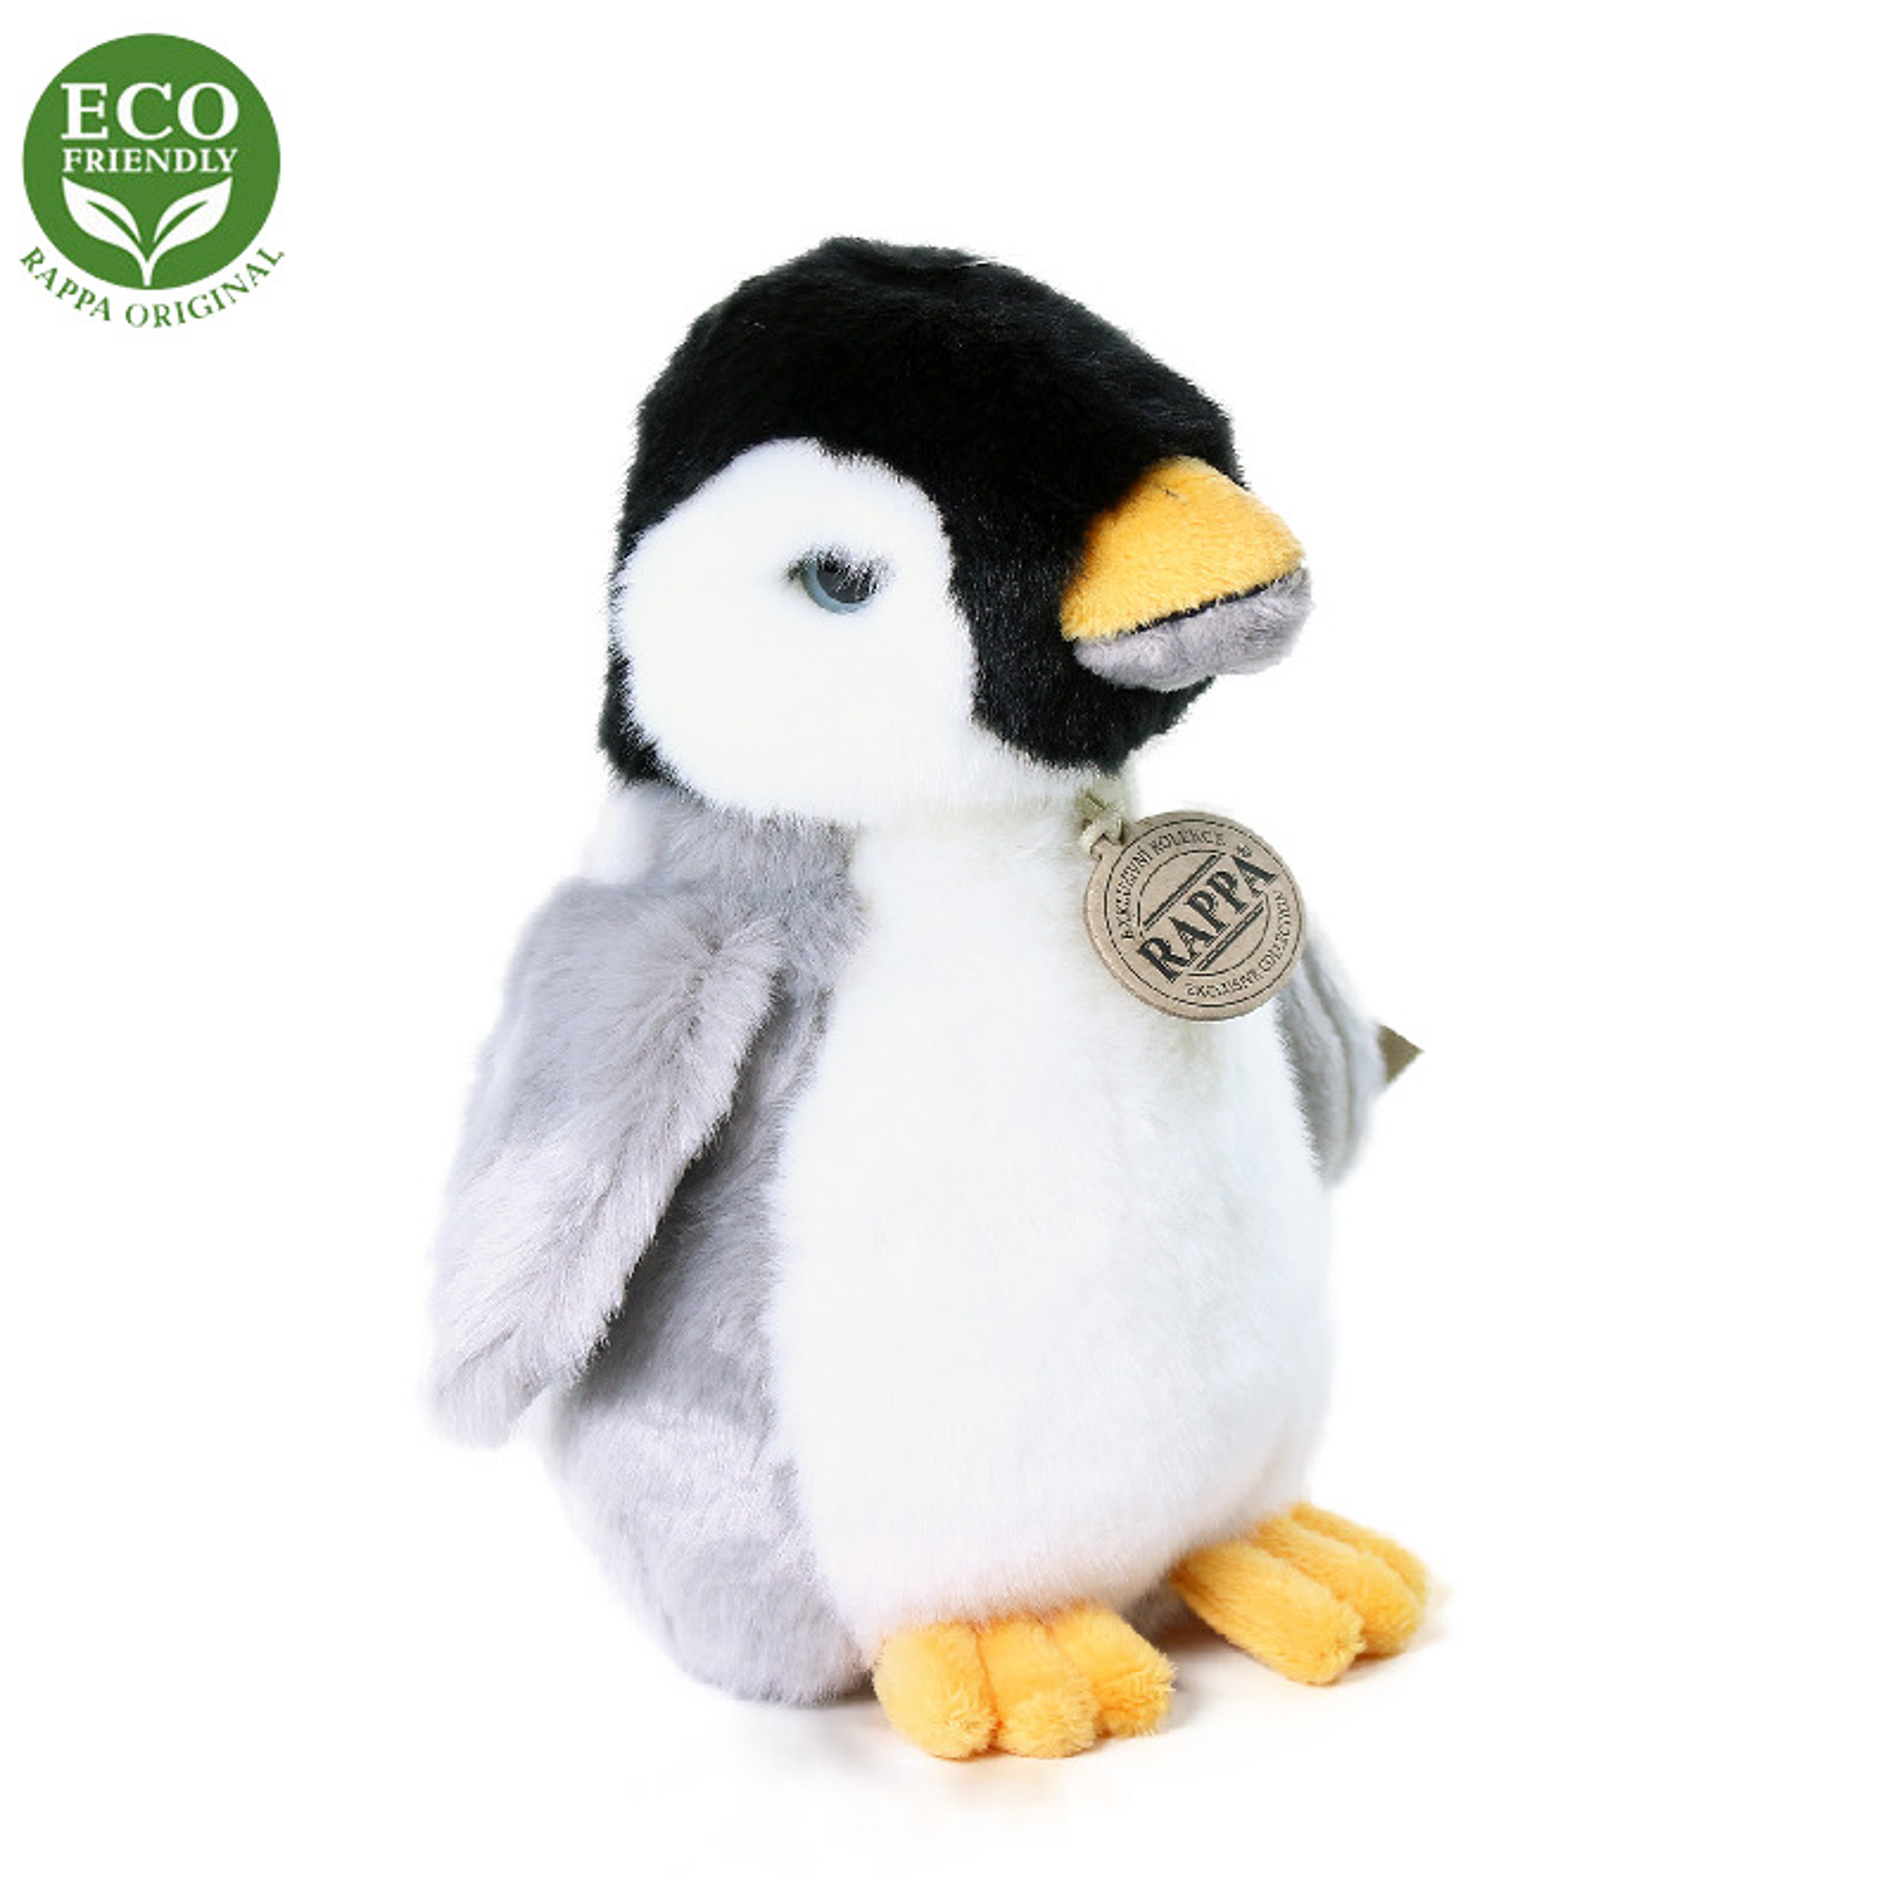 plyšový tučniak stojaci, 20 cm